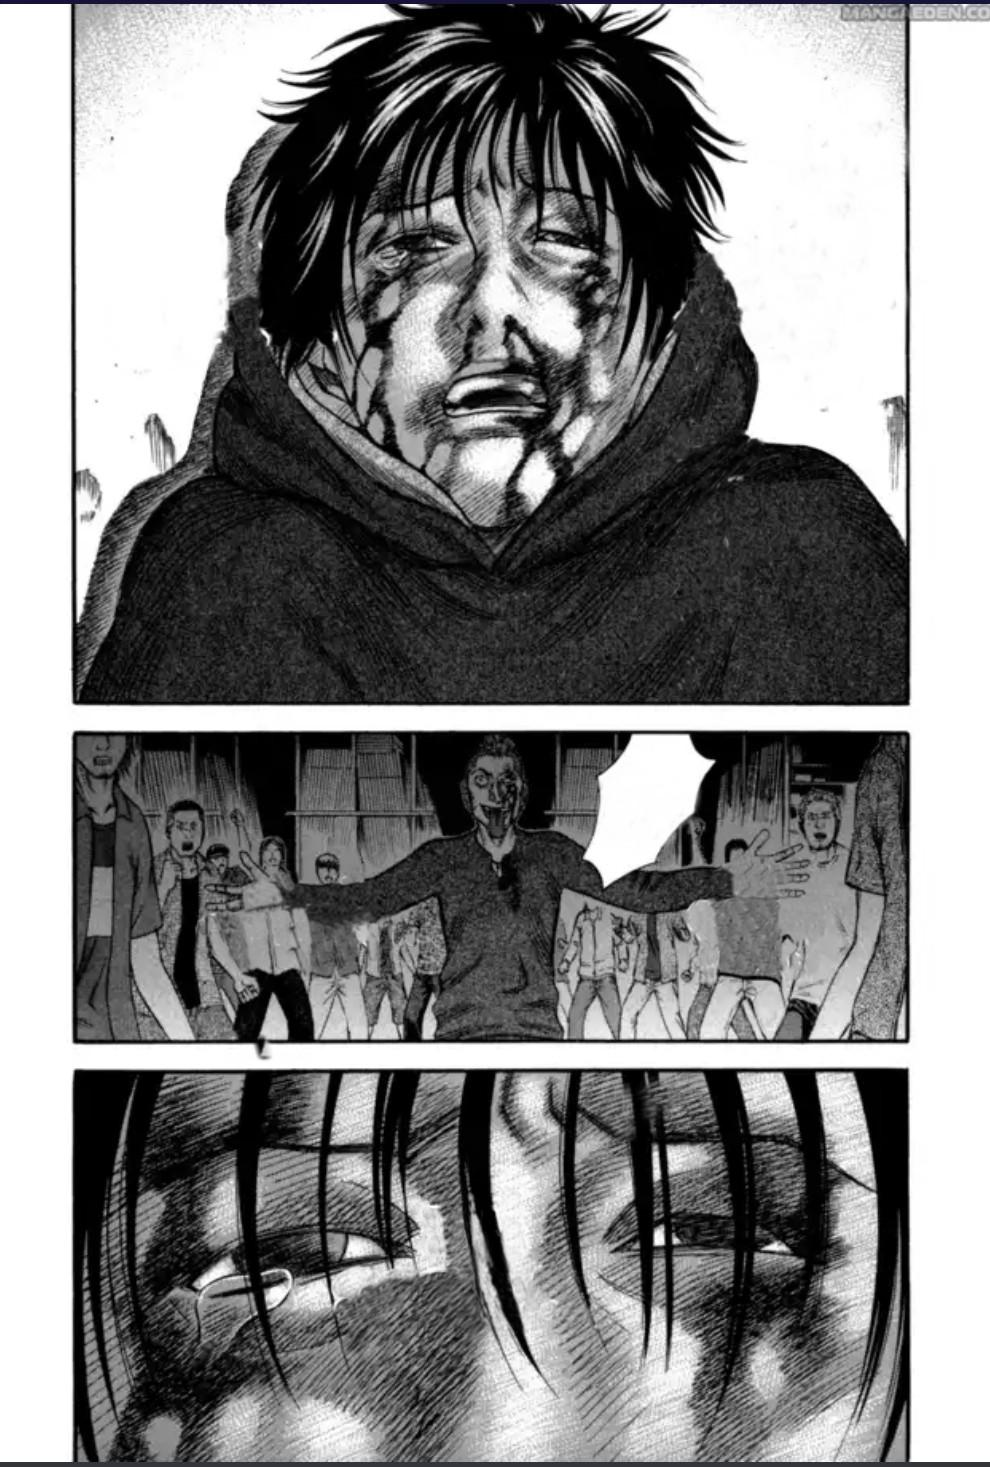 × Dark Storm × .. حيـن تعـصـف ريـآح الـإبدآع ! | فريق ترجمة المانجا - صفحة 31 Picsar12